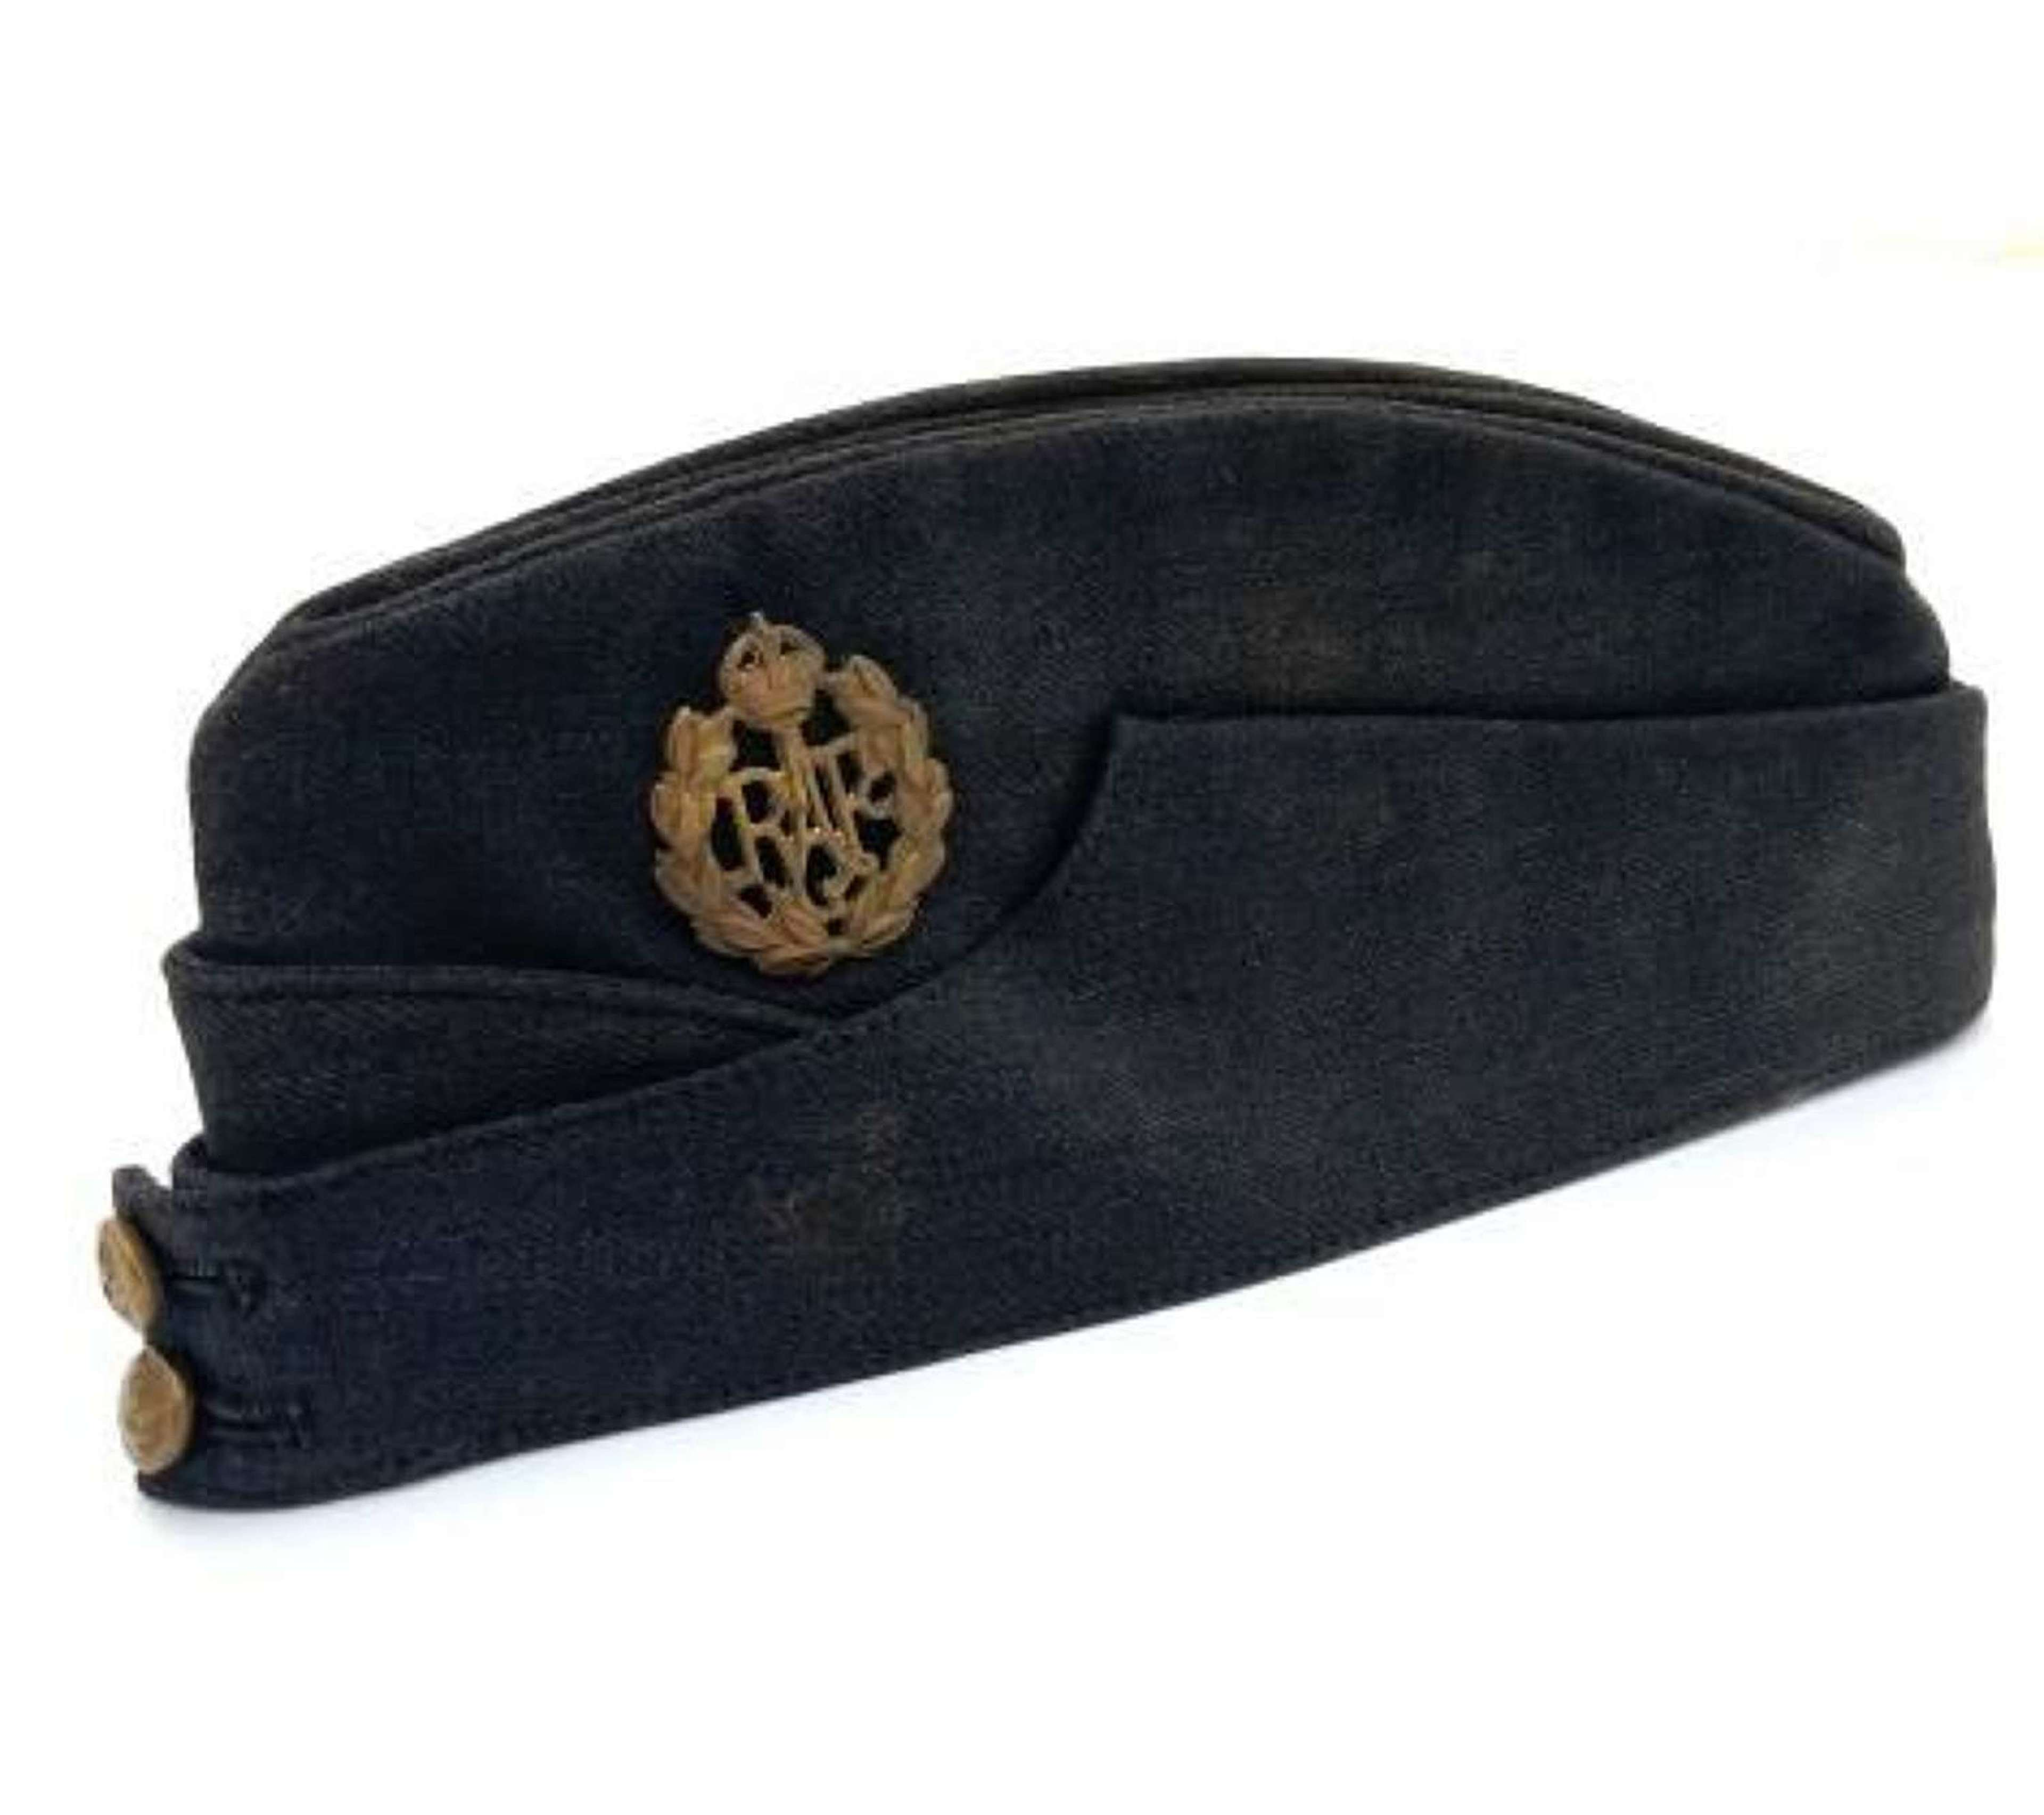 Original Early WW2 RAF Ordinary Airman's Side Cap